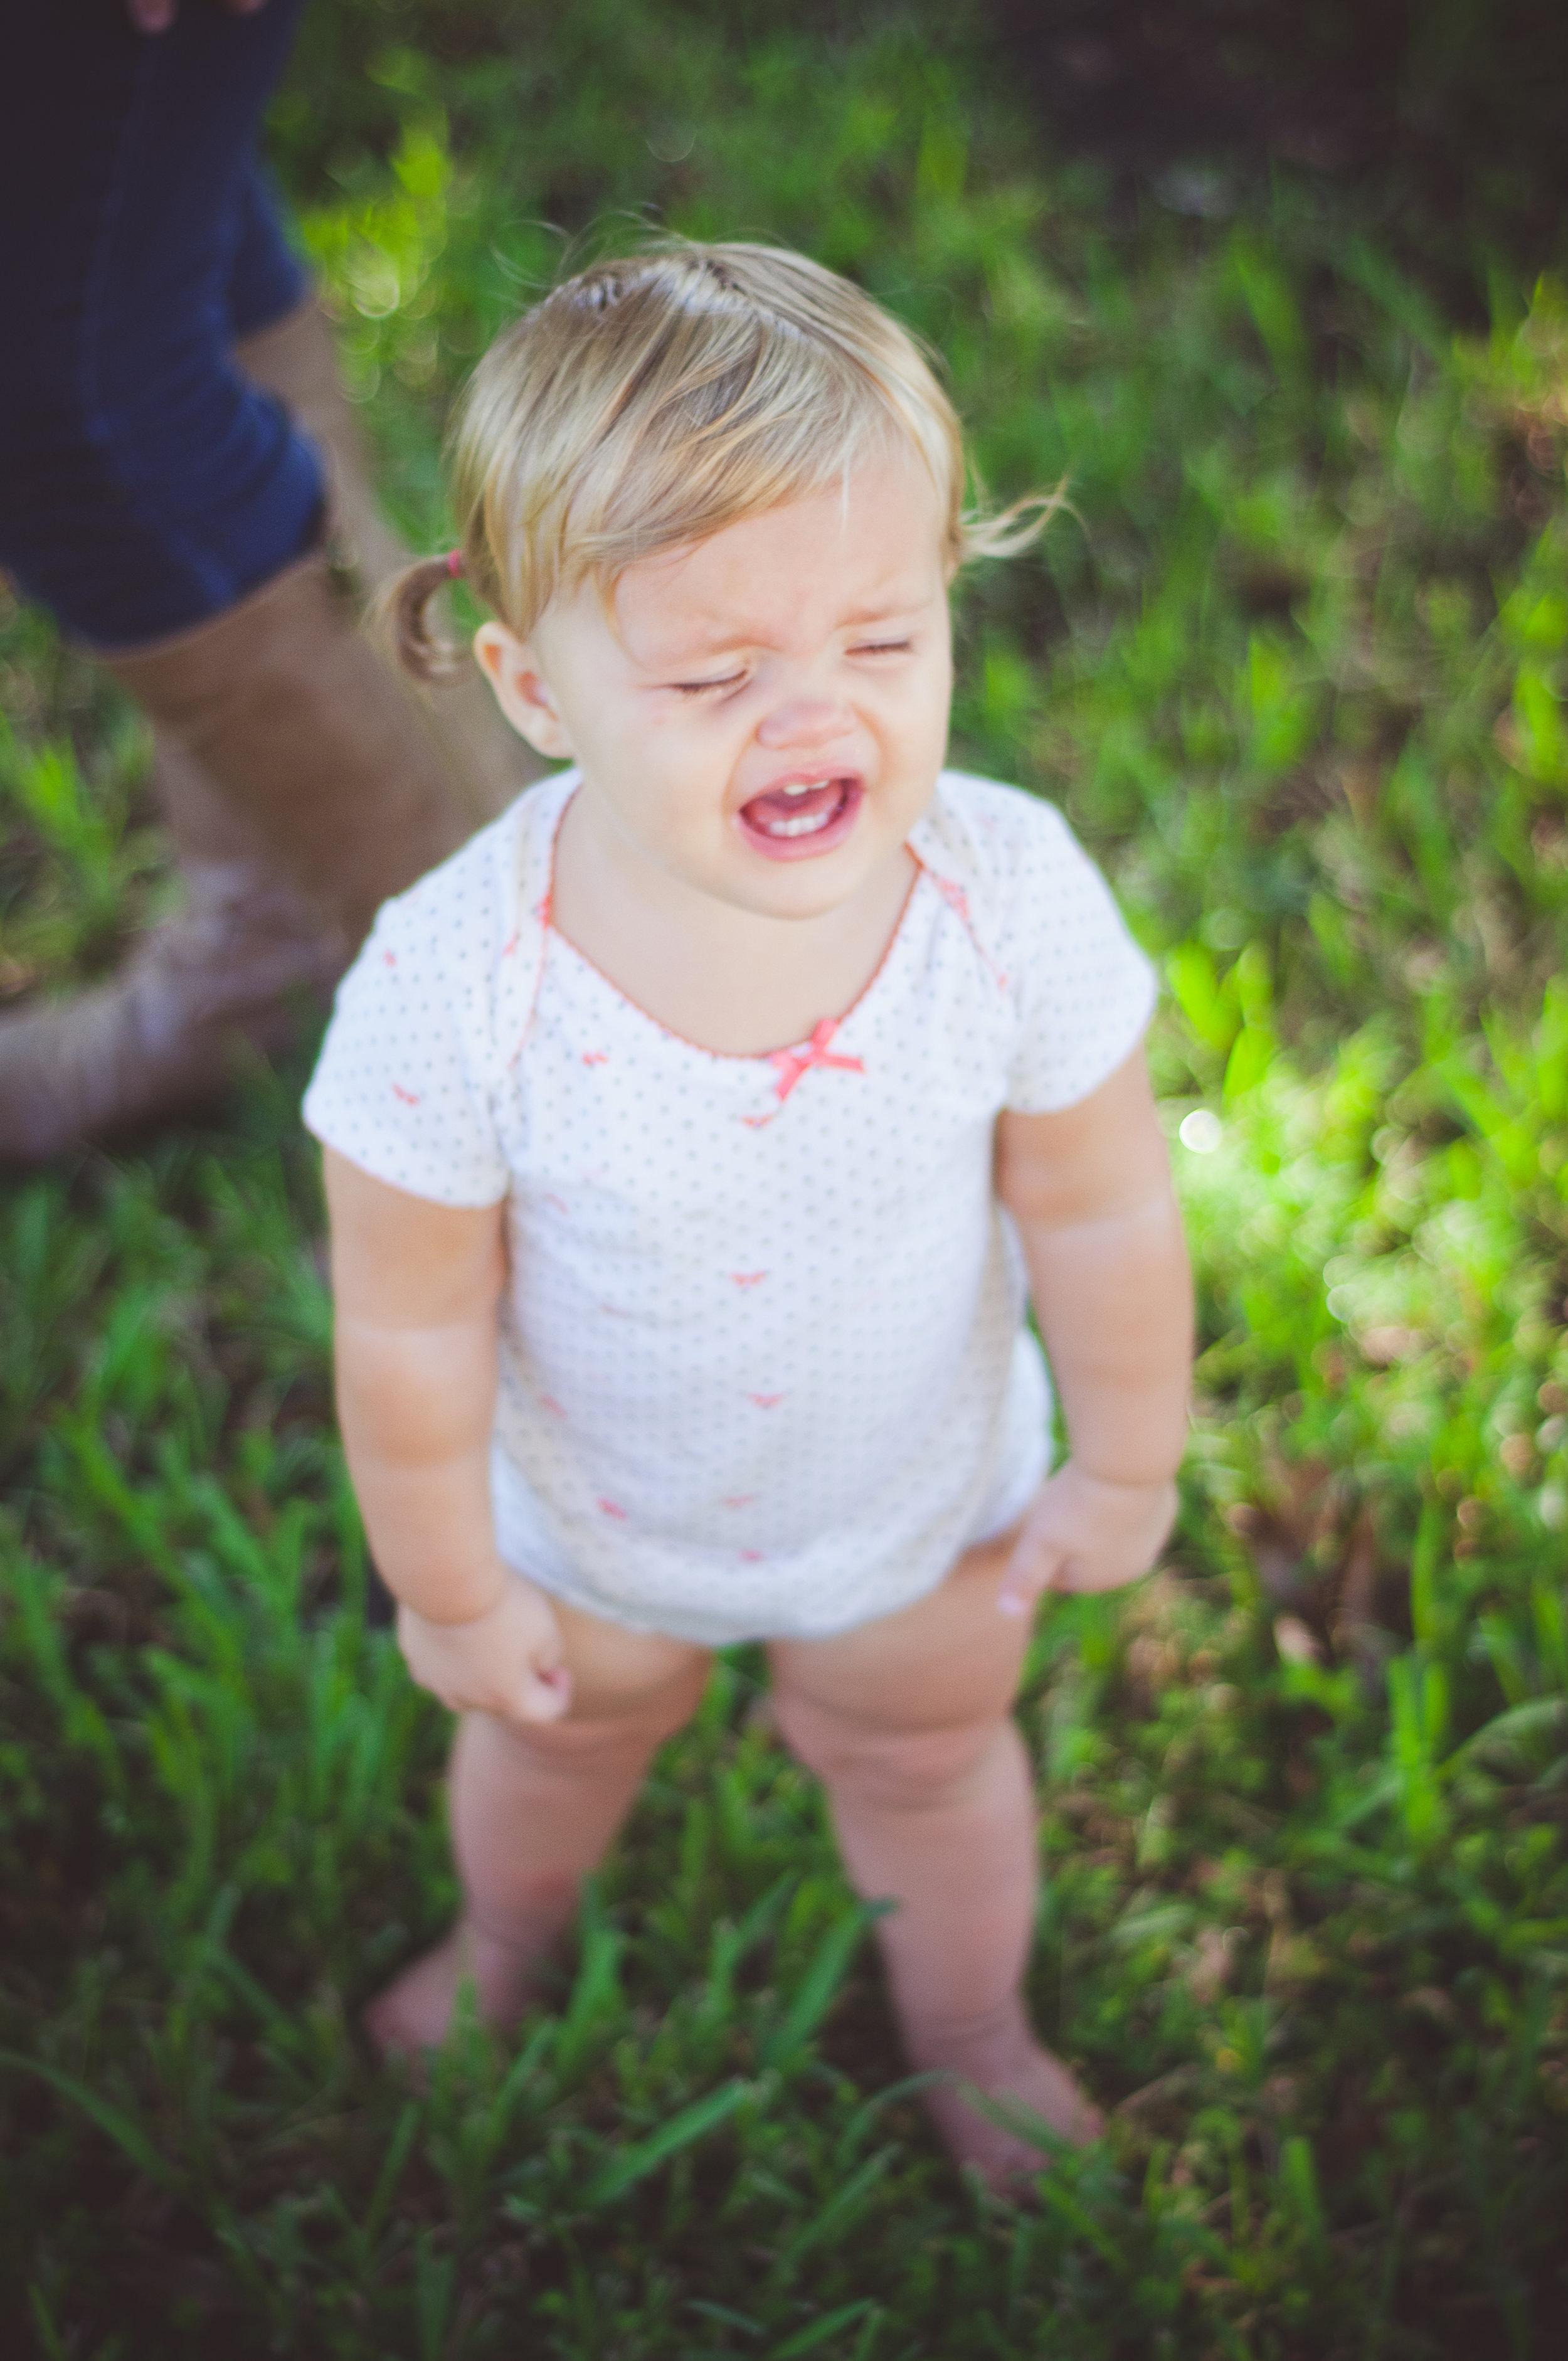 Why I Choose Obedience || sarah writes || sarahsandel.com